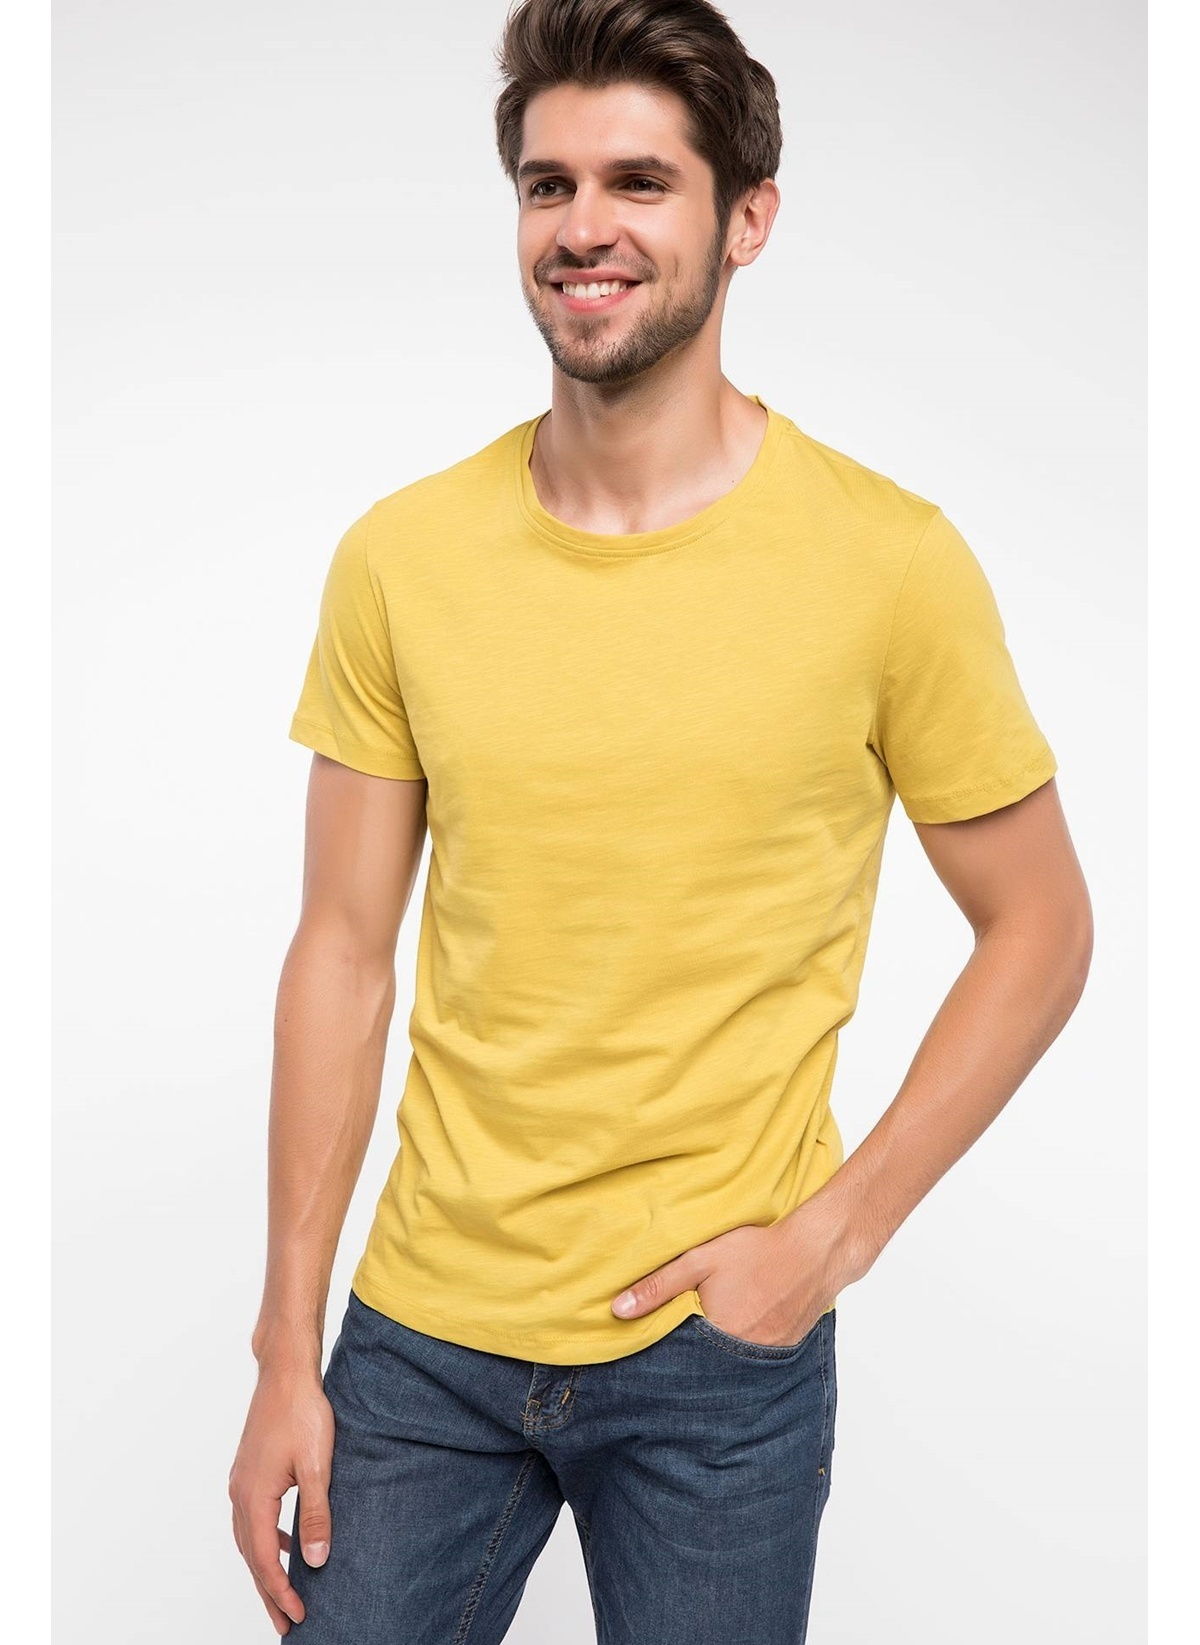 Defacto Slim Fit T-shirt J6671az18hsyl276t-shirt – 29.99 TL